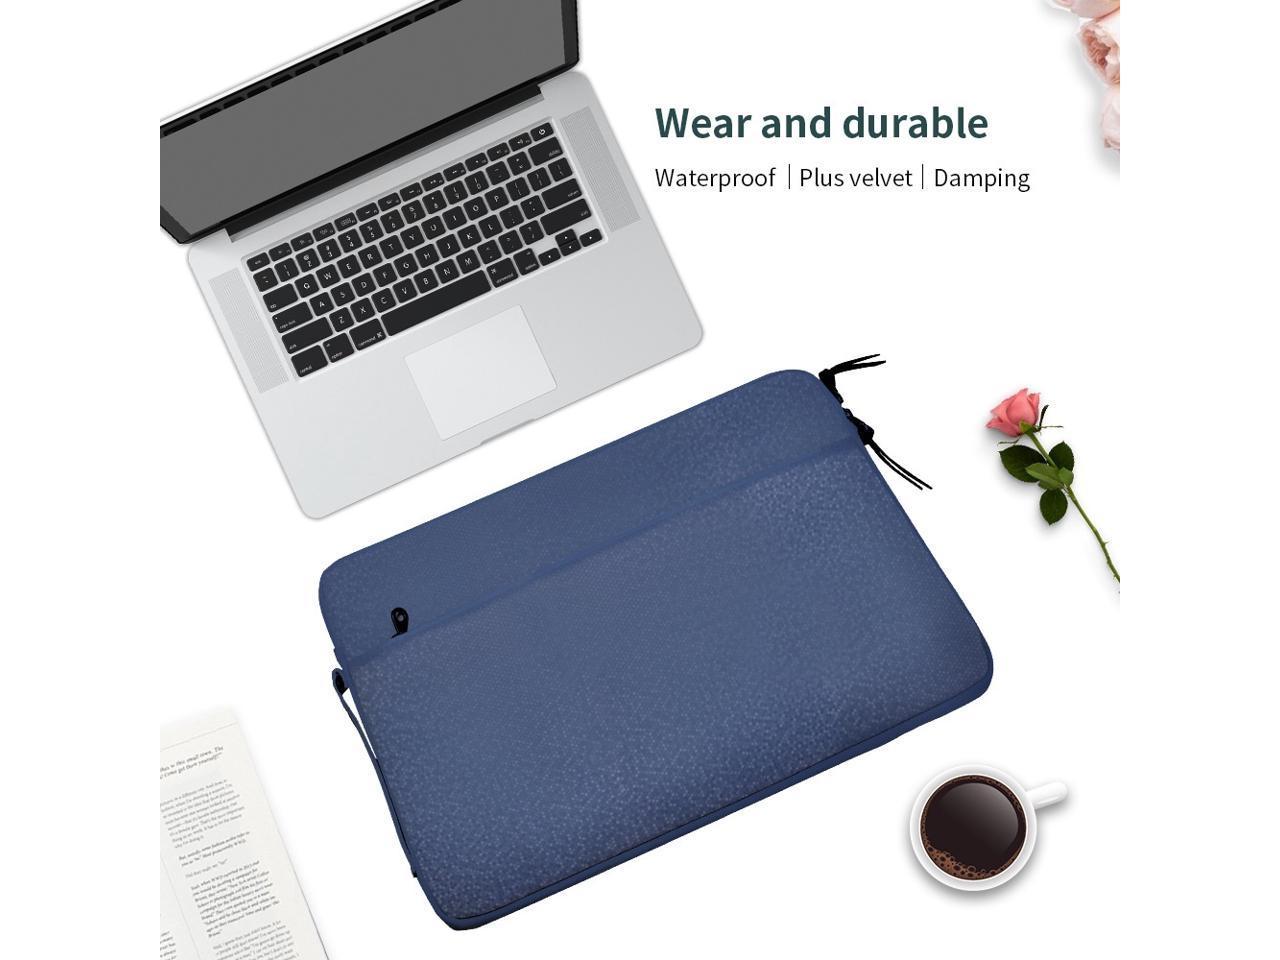 Dark Blue Laptop Handbag Color : Grey KANEED Diamond Pattern Portable Waterproof Sleeve Case Double Zipper Briefcase Laptop Carrying Bag for 13-13.3 inch Laptops